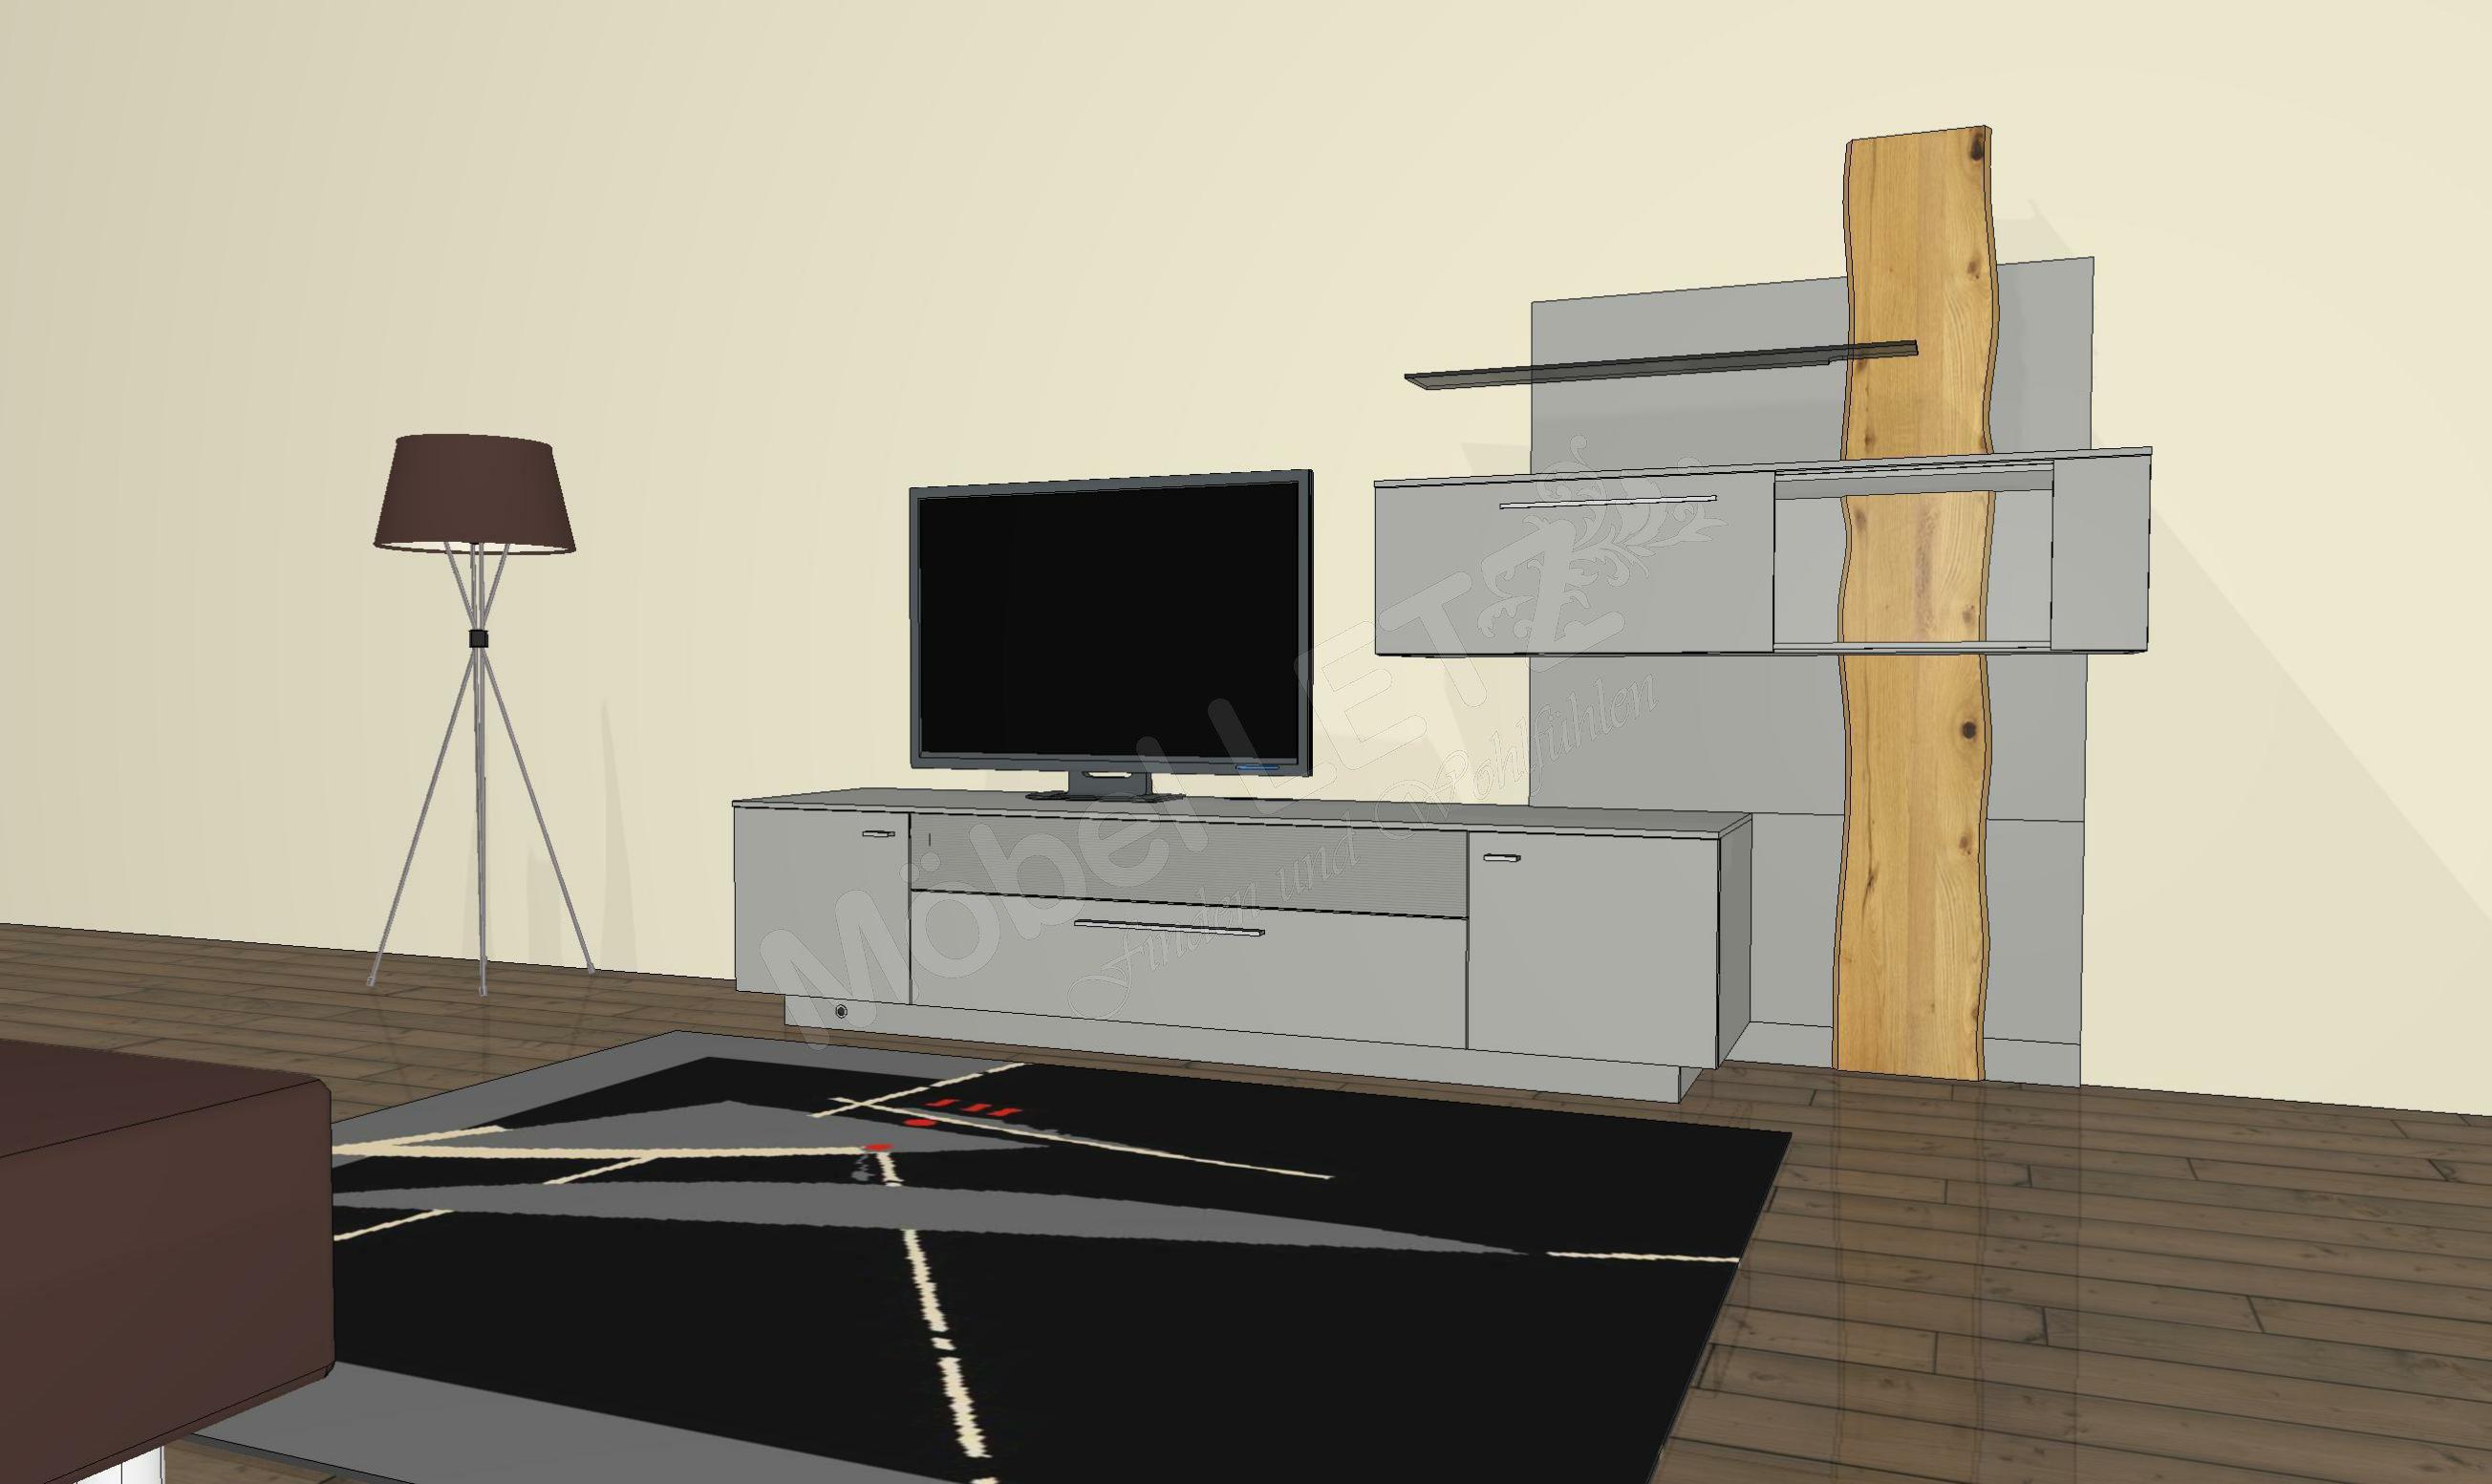 gwinner wohnwand lucca lc4 inklusive beleuchtung m bel letz ihr online shop. Black Bedroom Furniture Sets. Home Design Ideas